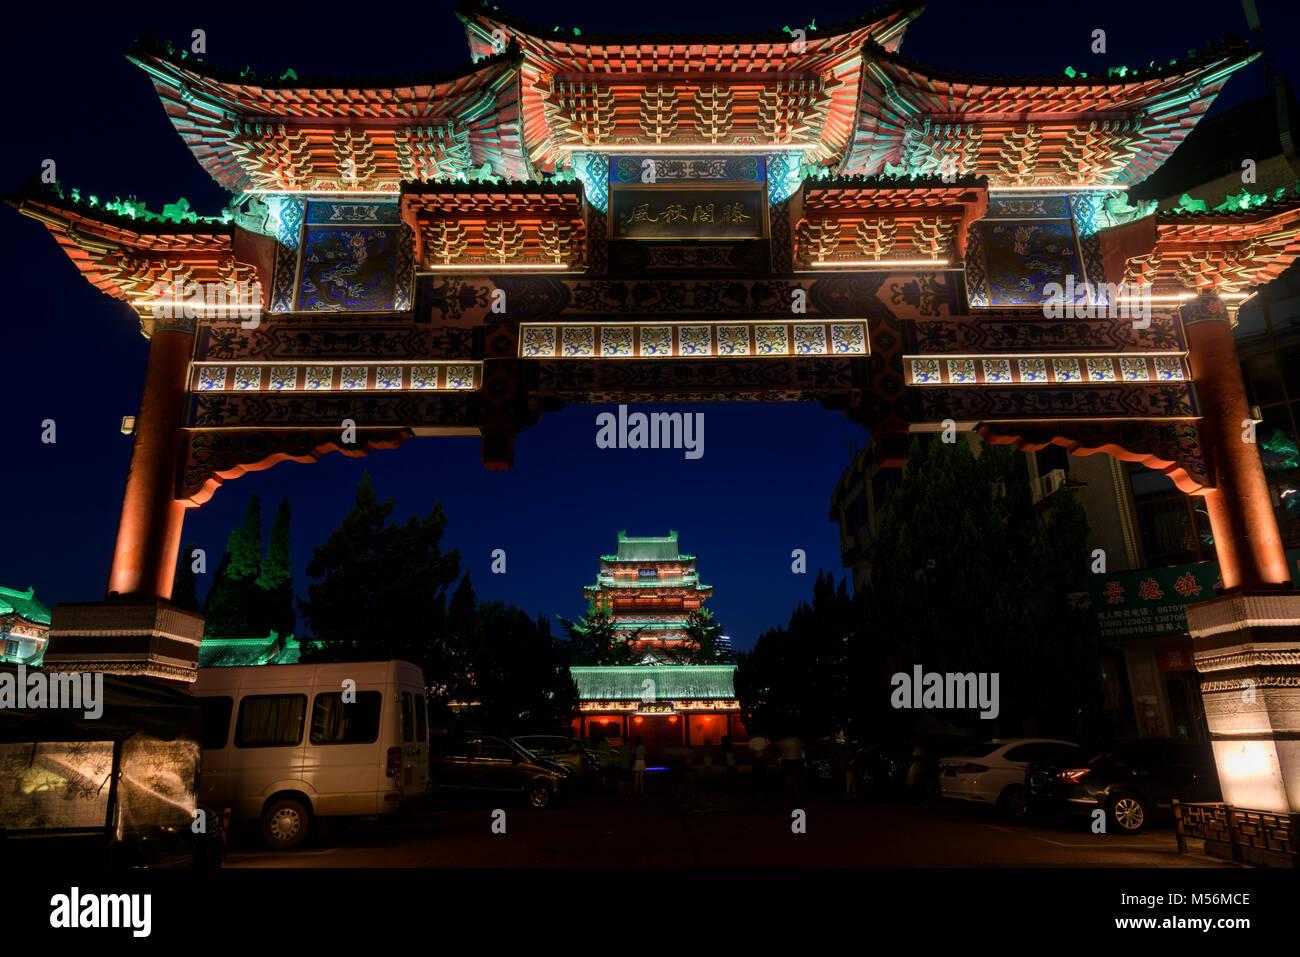 Tengwang Nanchang Pavilion Traditional Ancient Chinese Architecture